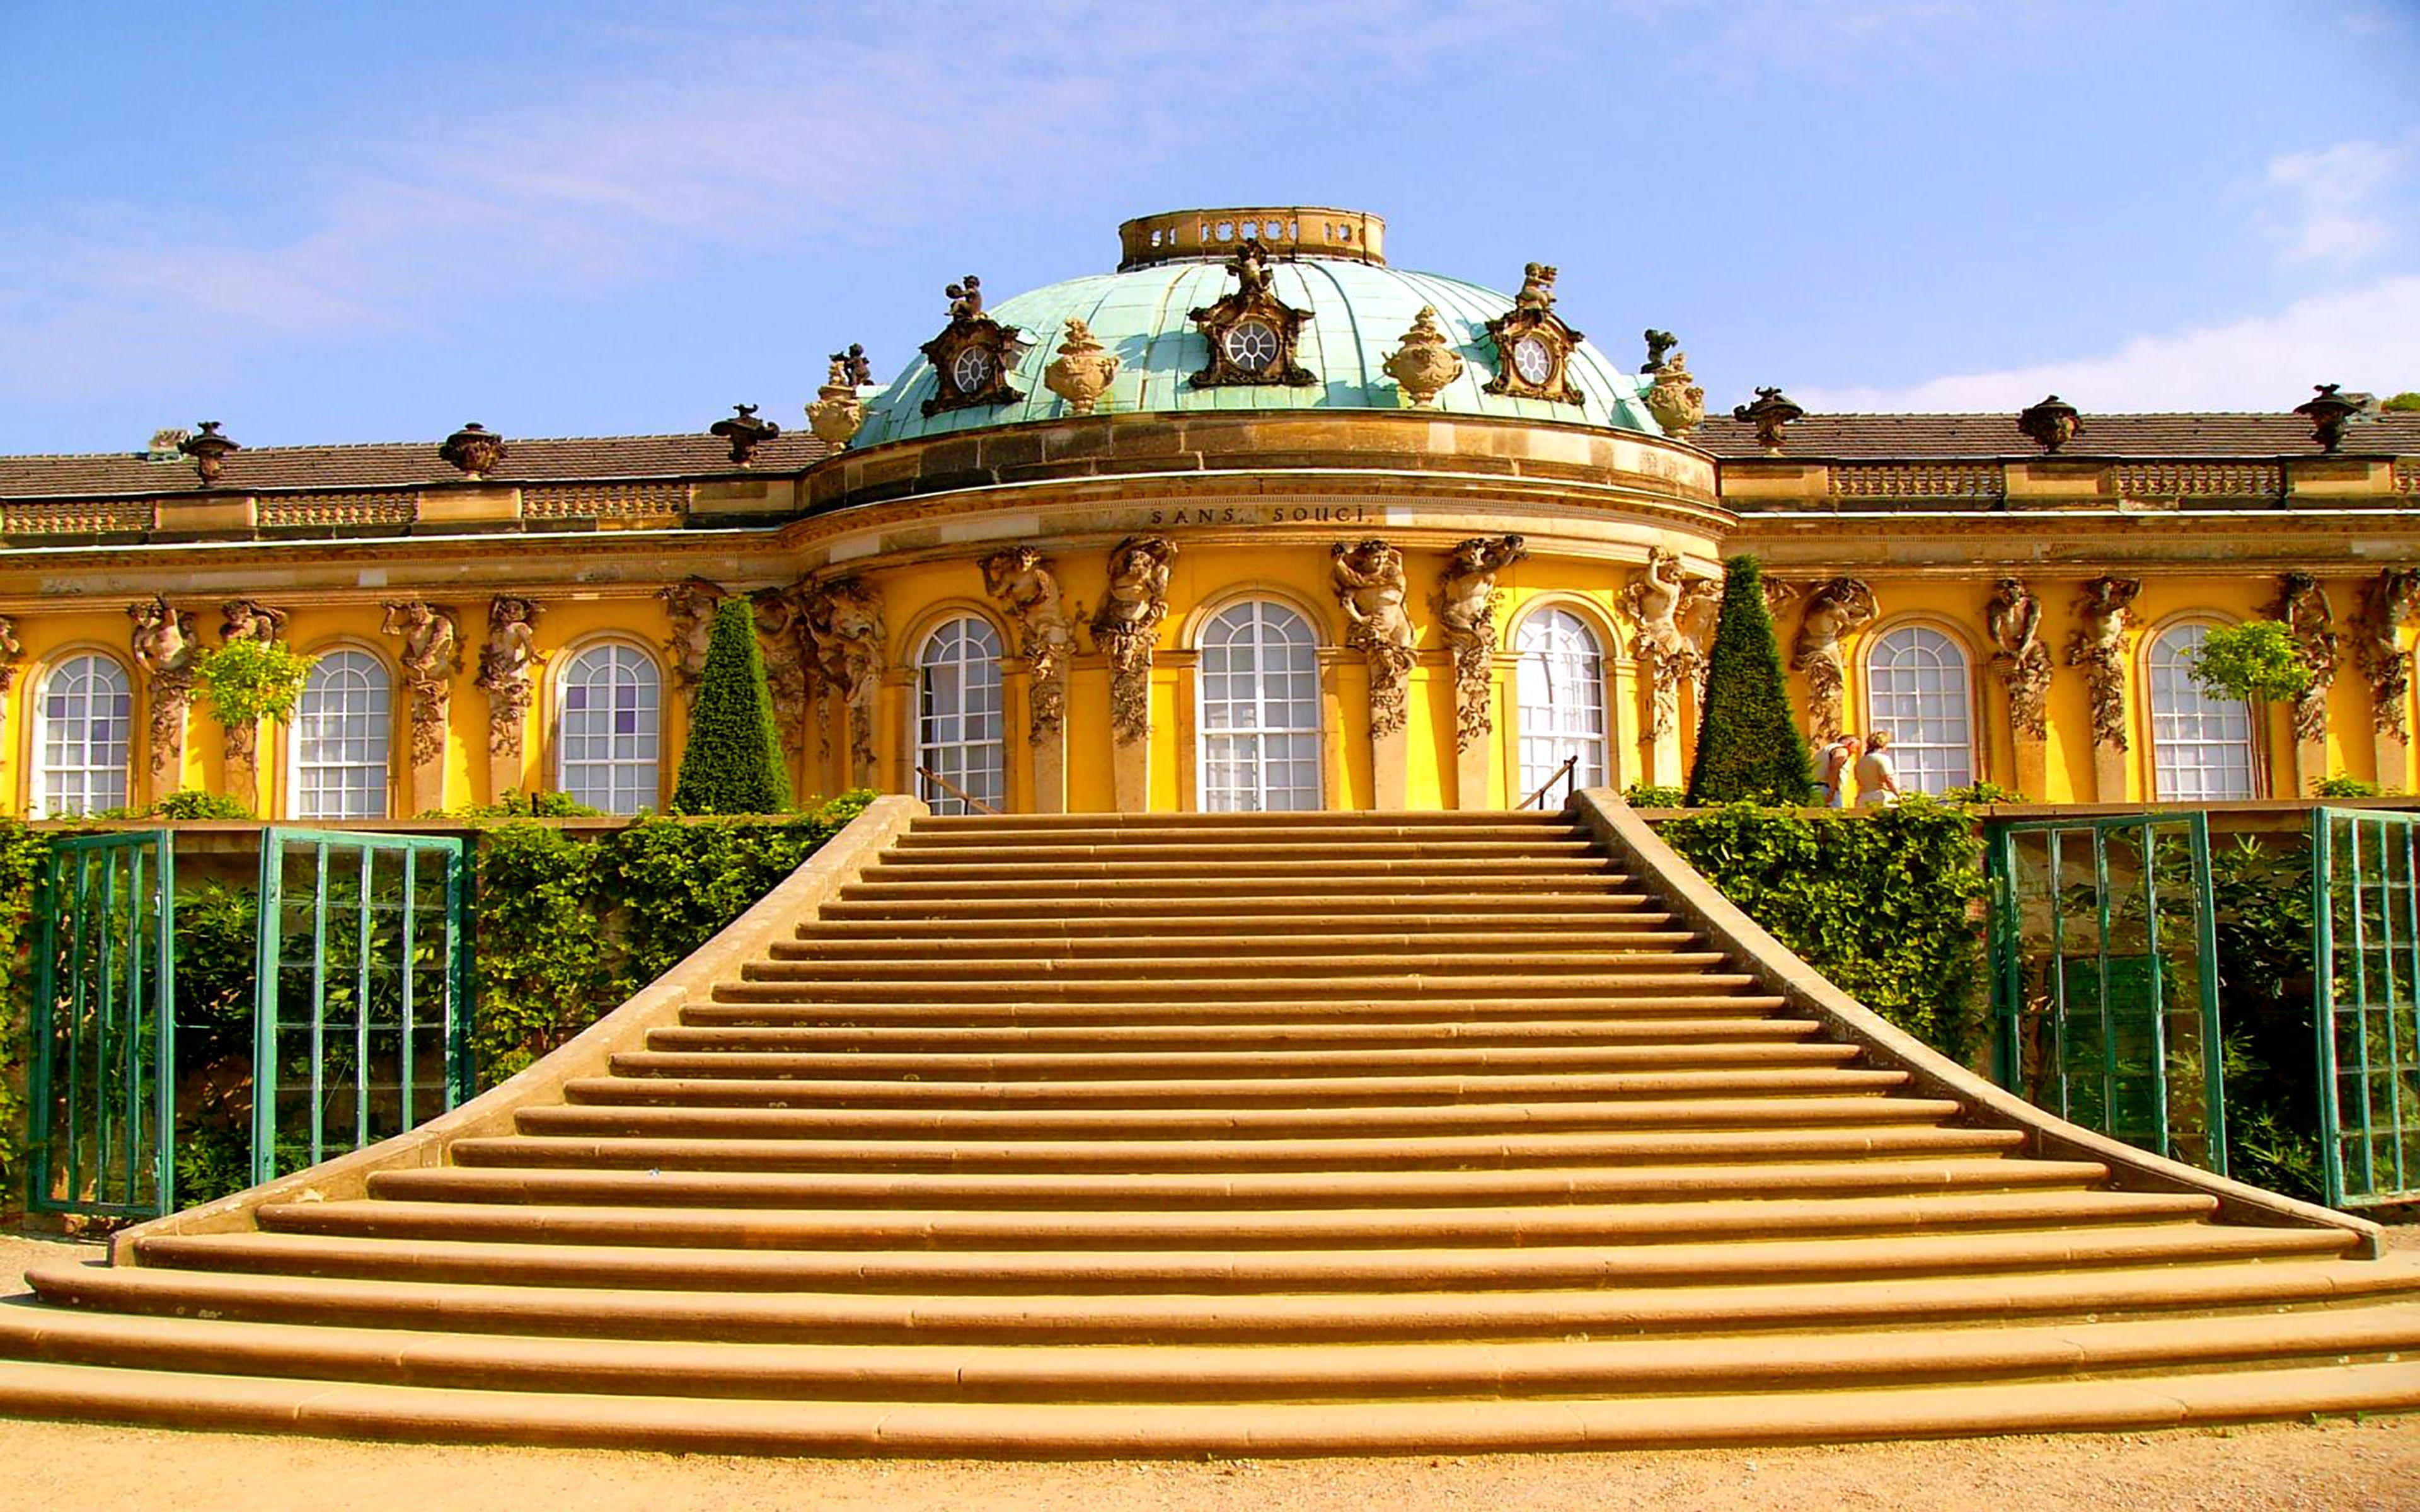 Sanssouci In 2020 Sanssouci Deutschland Burgen Potsdam Schloss